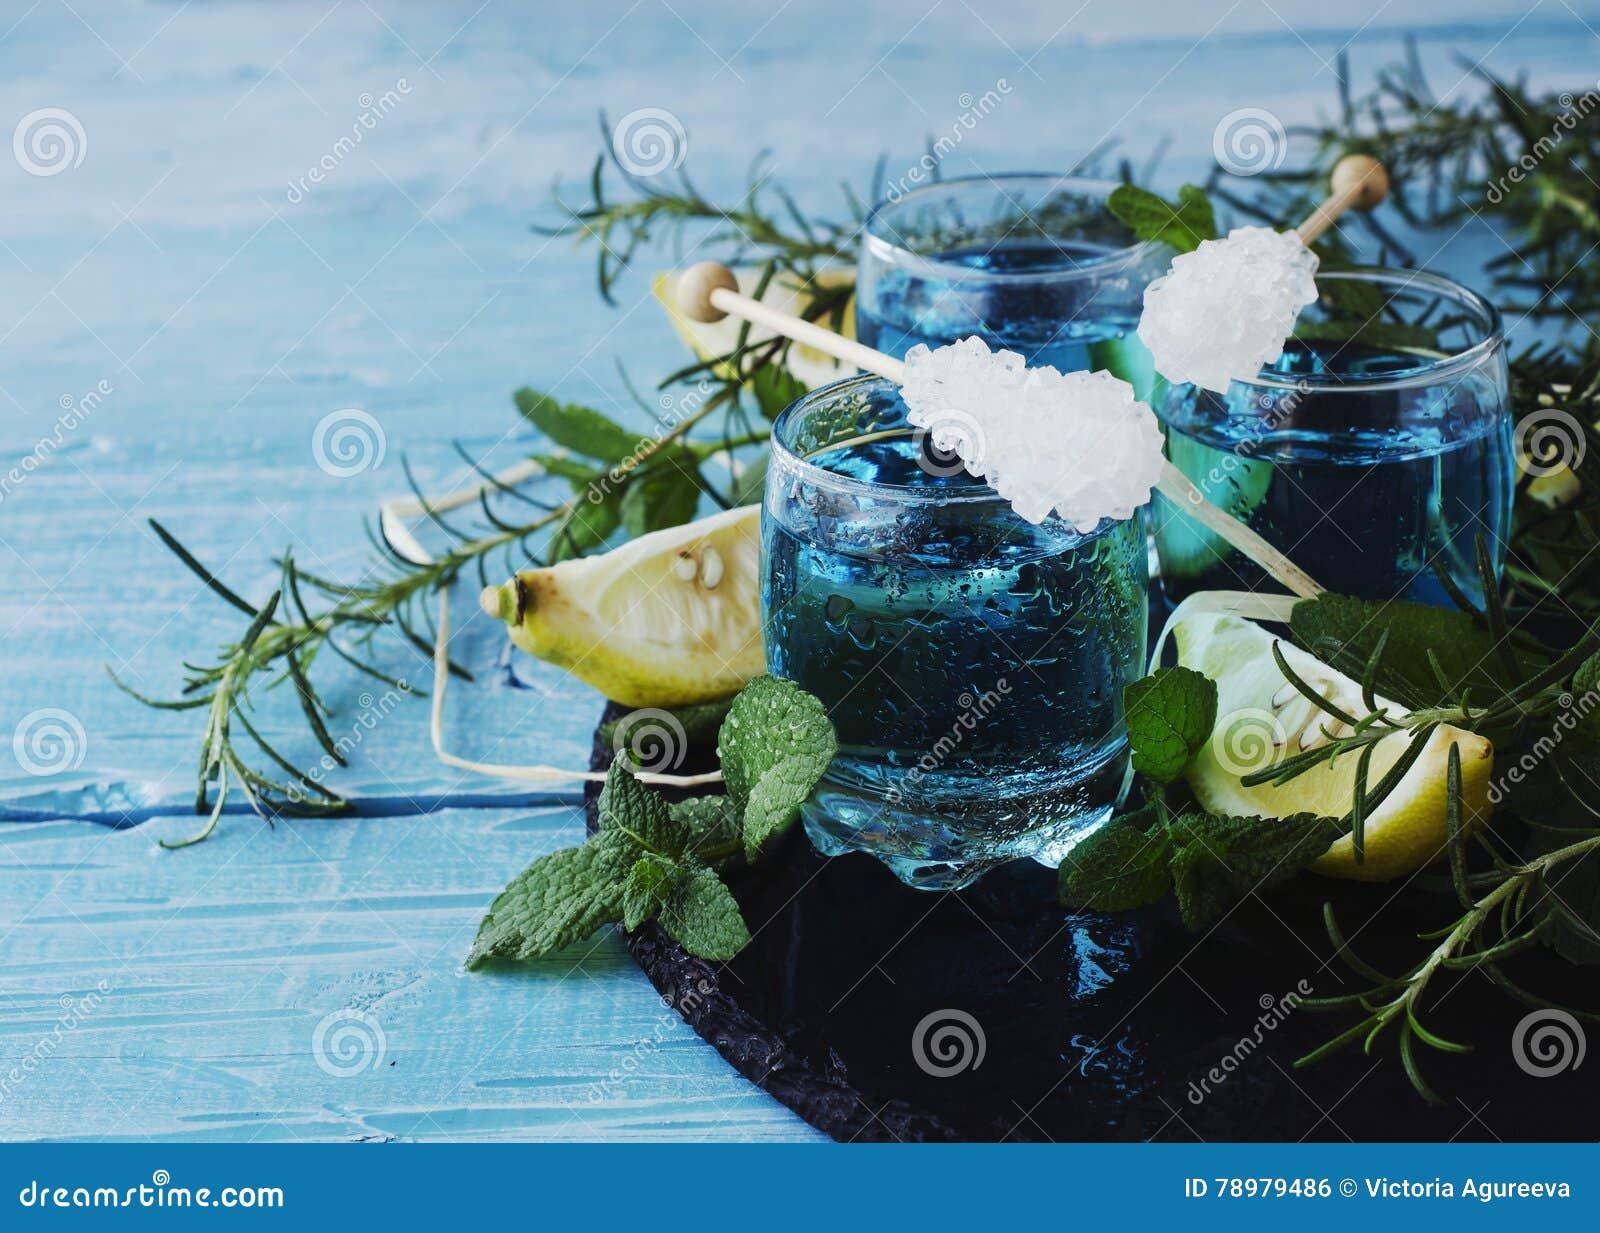 Blauwe curacao likeur of sambuca met citroen